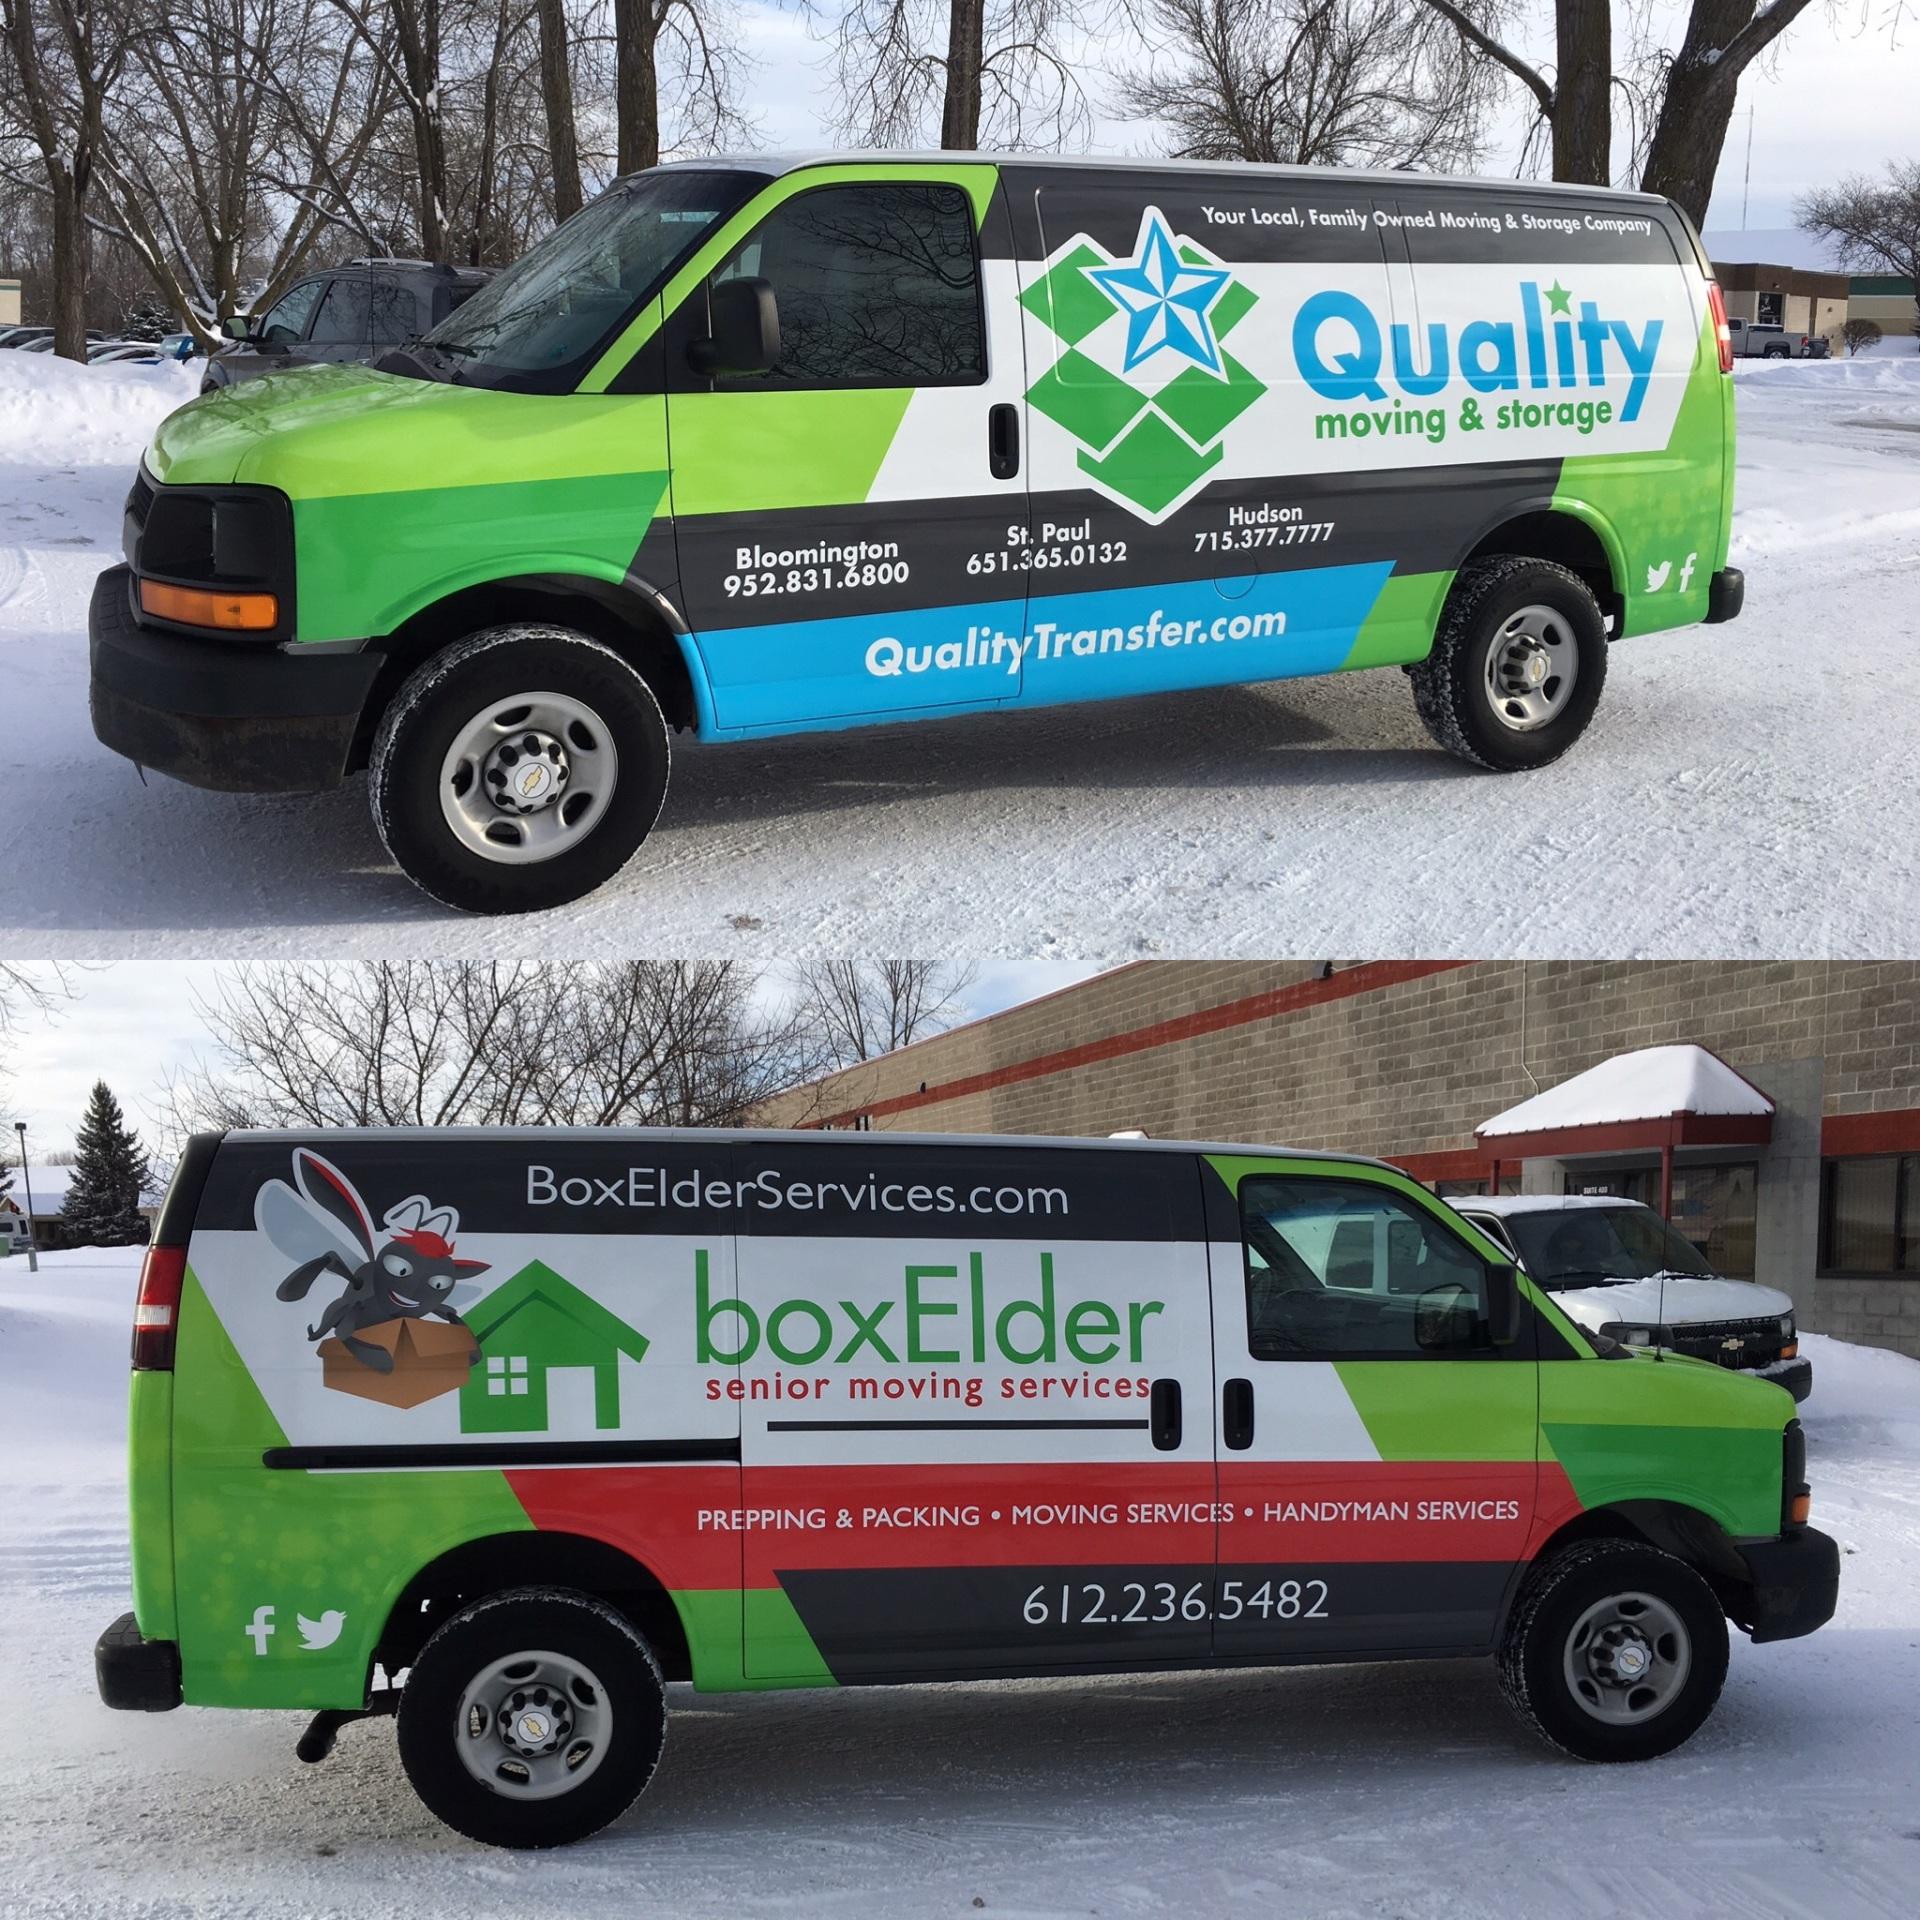 Vehicle Wraps MN, Truck wraps, car wraps, graphics, decals,fleet graphics